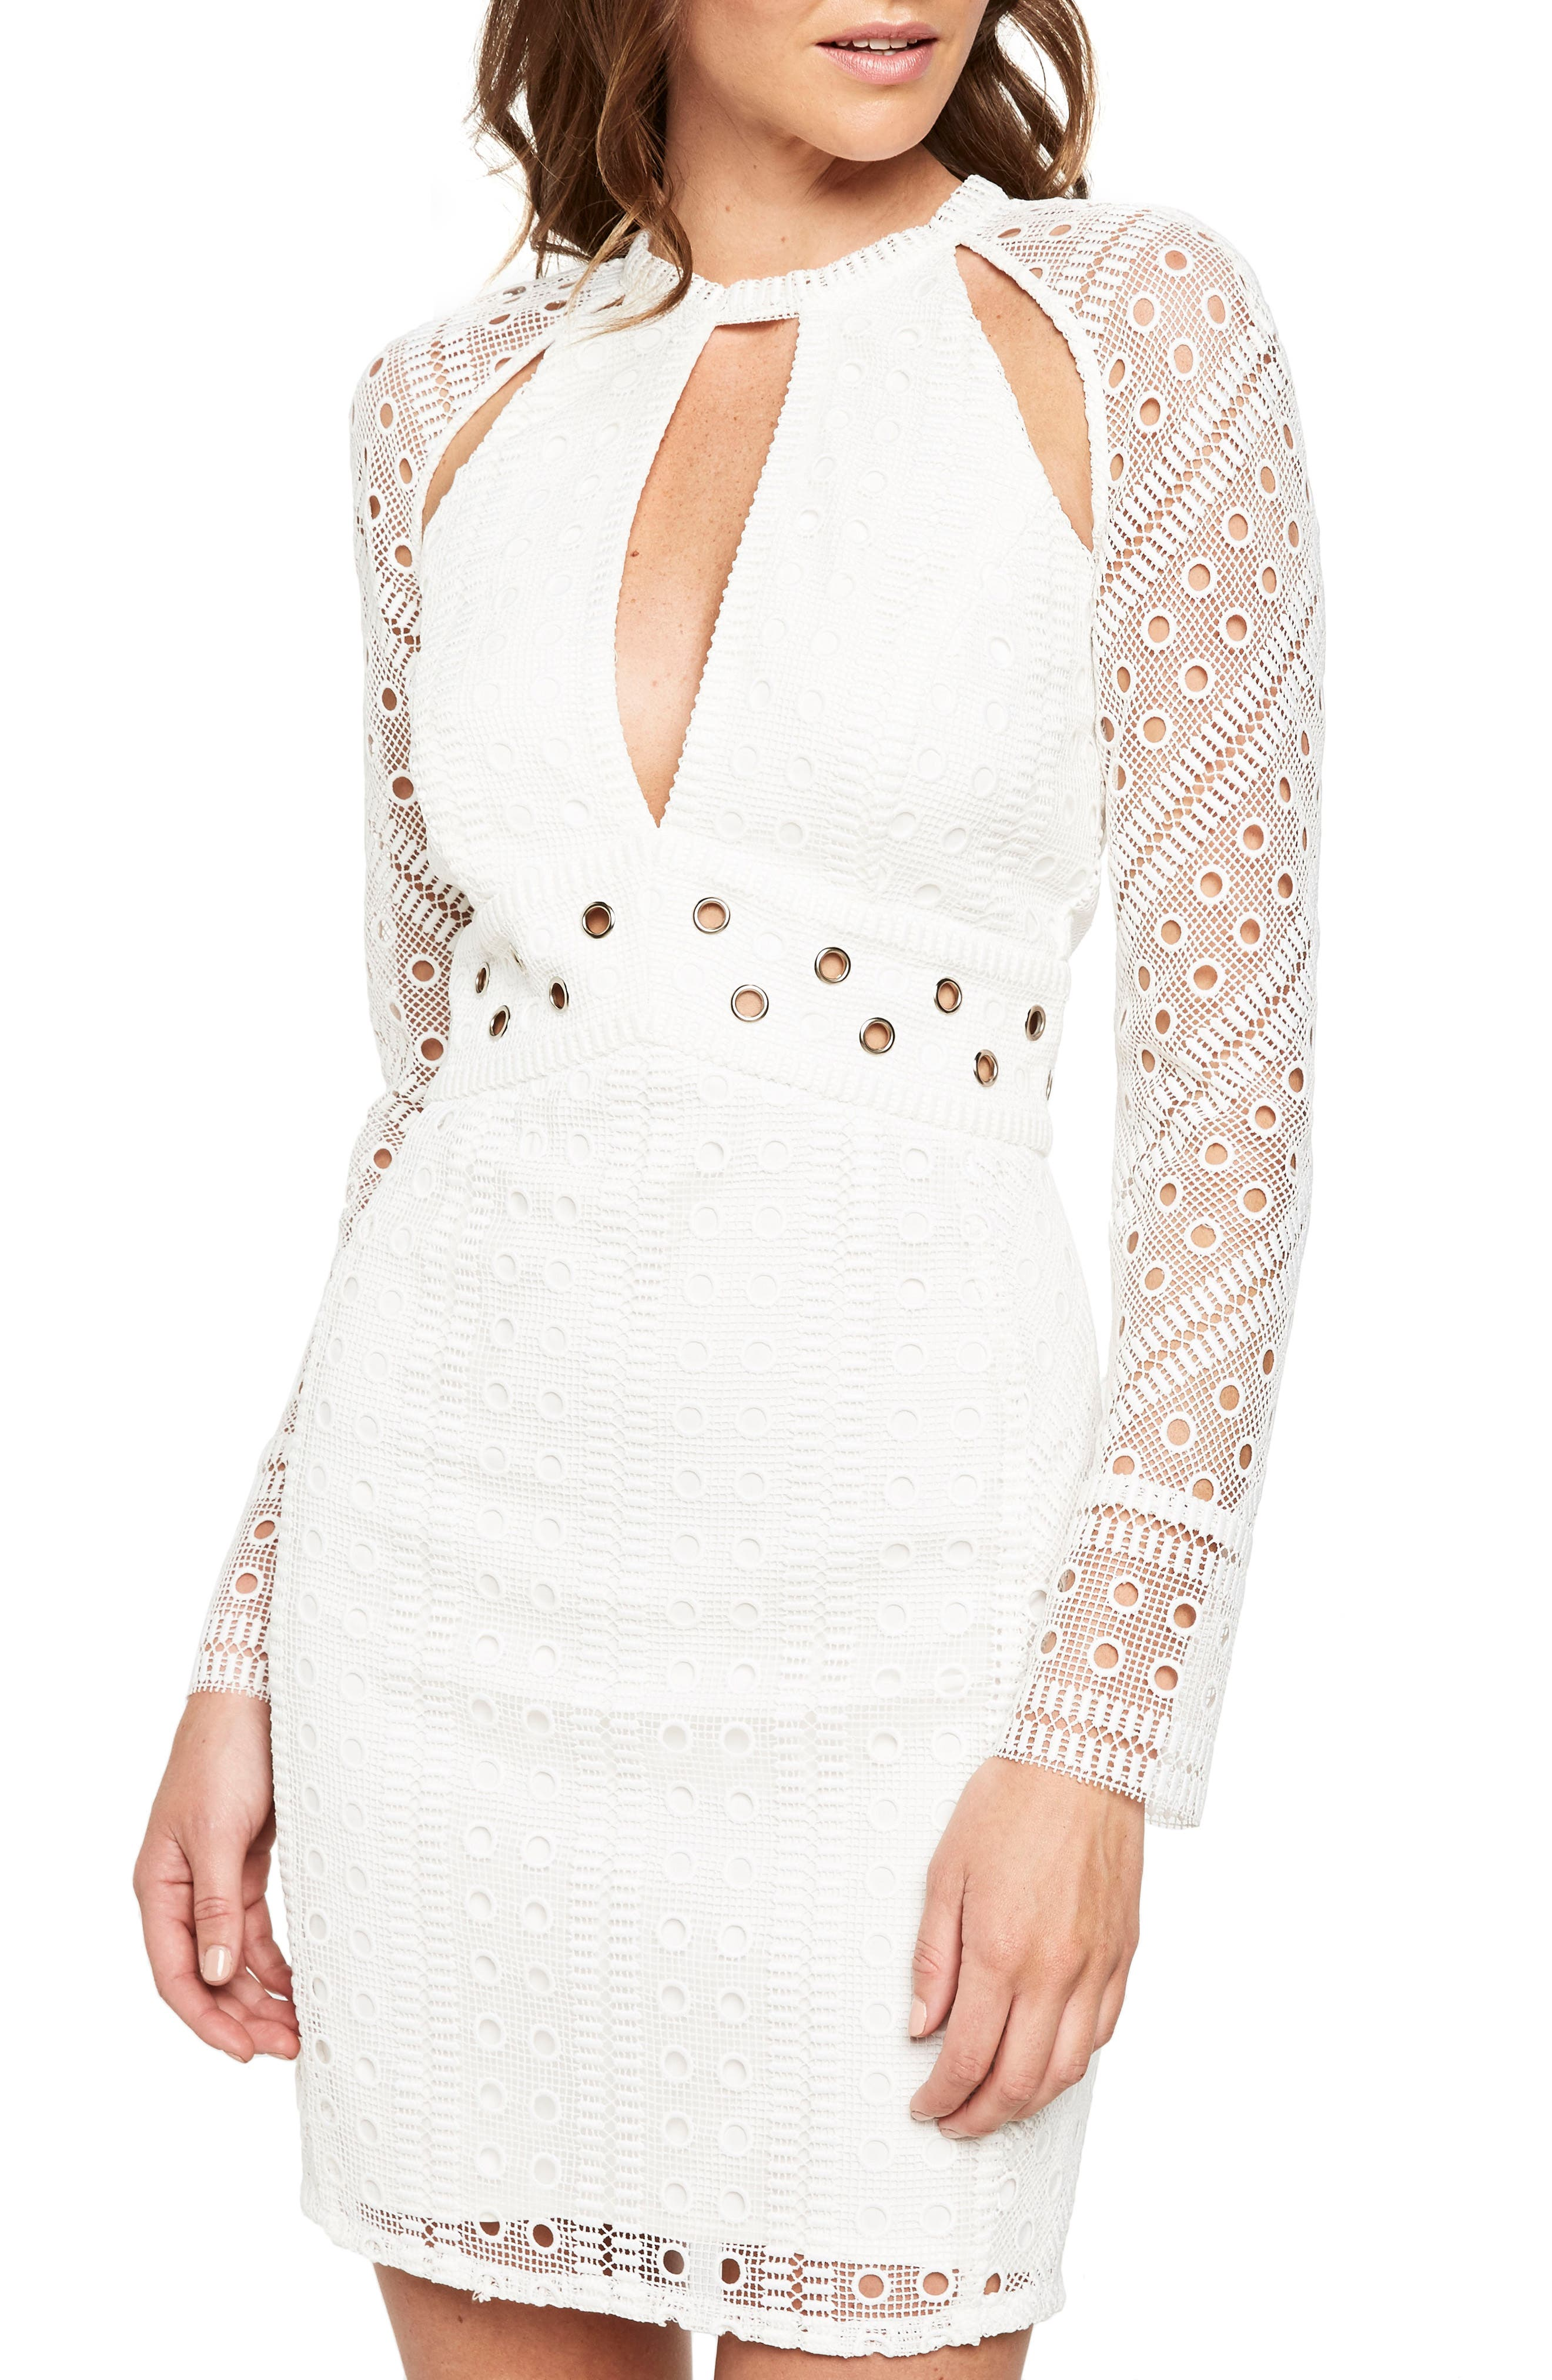 Alternate Image 1 Selected - Bardot Grommet Detail Broderie Anglaise Dress